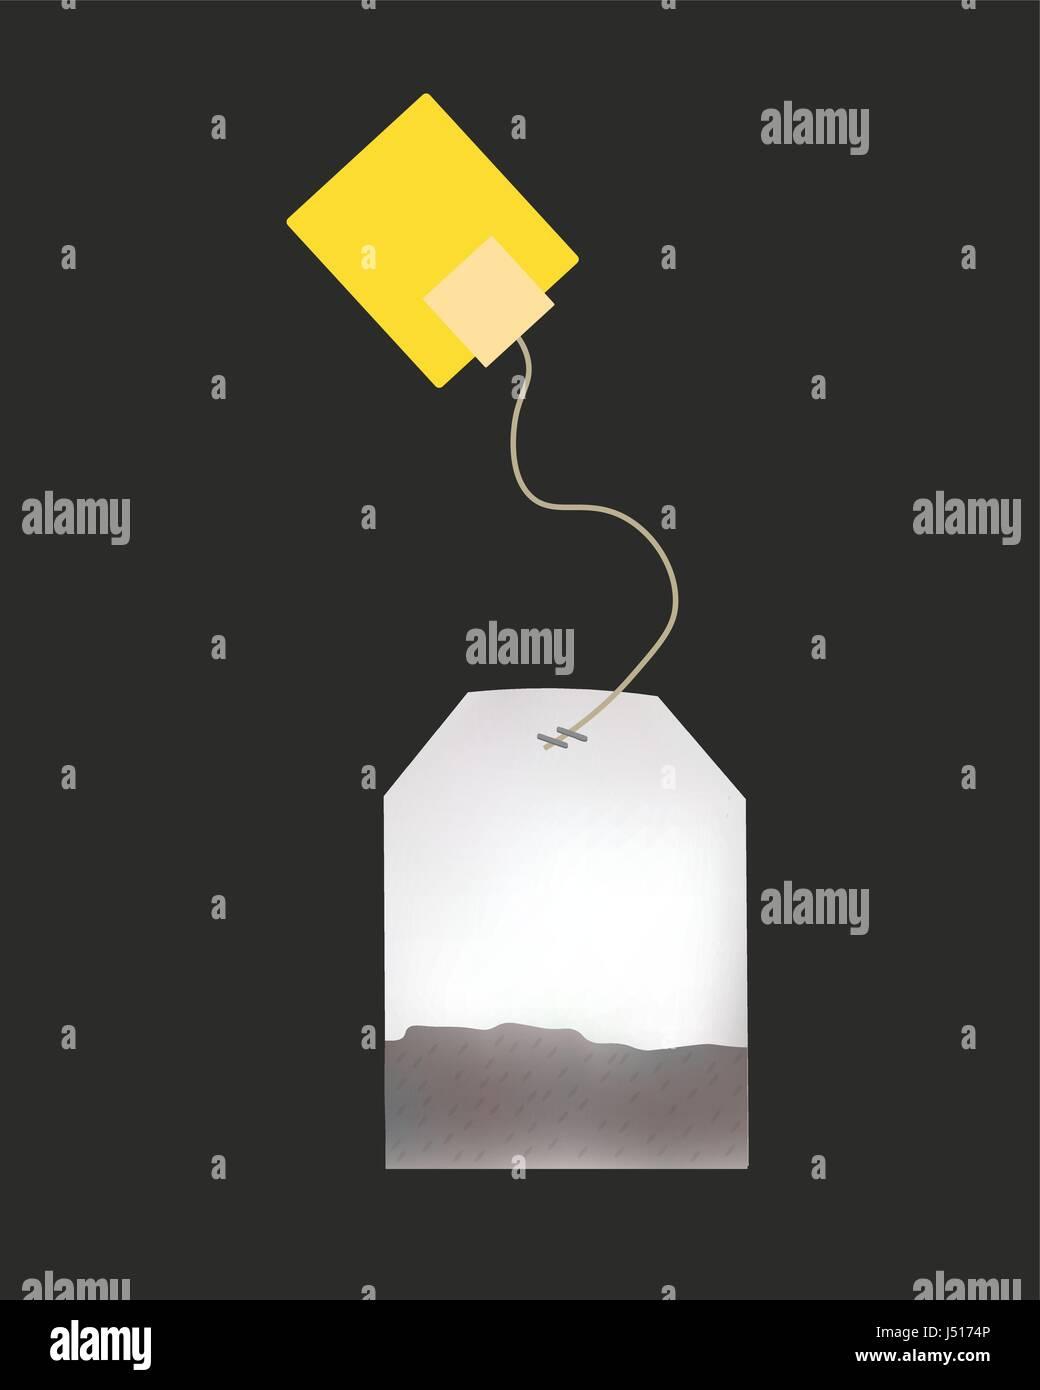 Tea Bag Label Template from c8.alamy.com